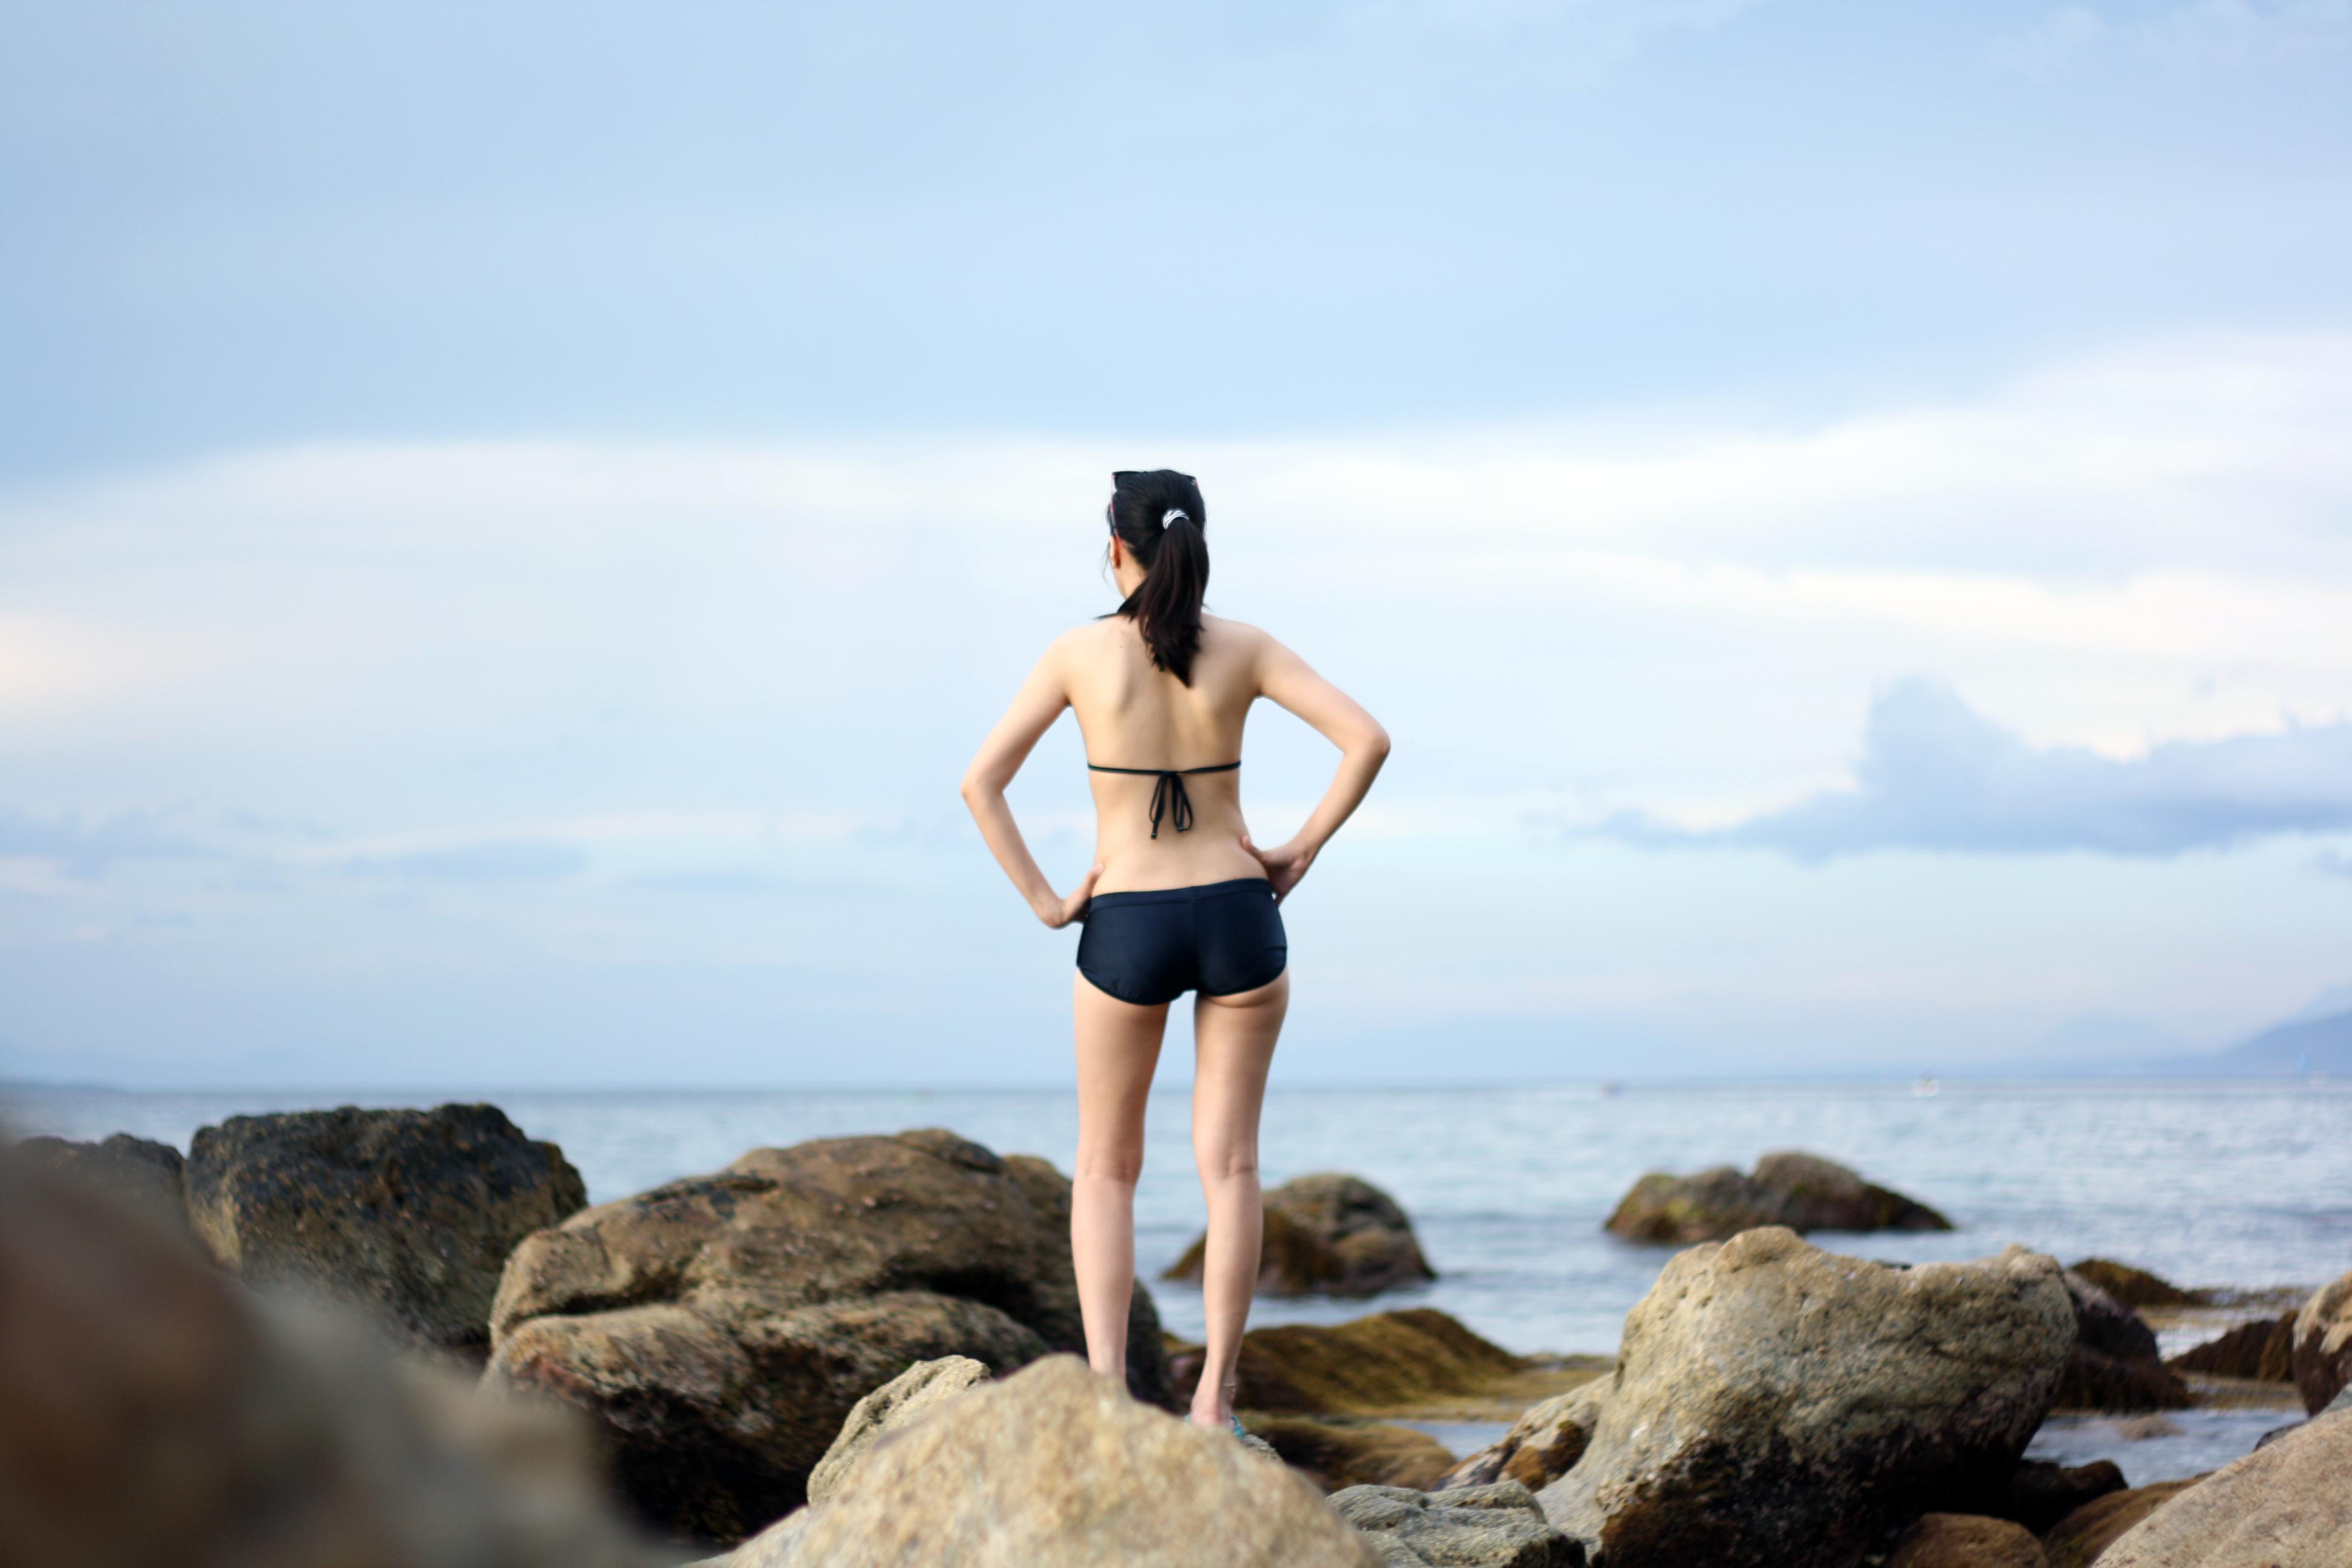 Free stock photo of beach, holiday, vacation: https://www.pexels.com/photo/woman-girl-beach-bikini-34448